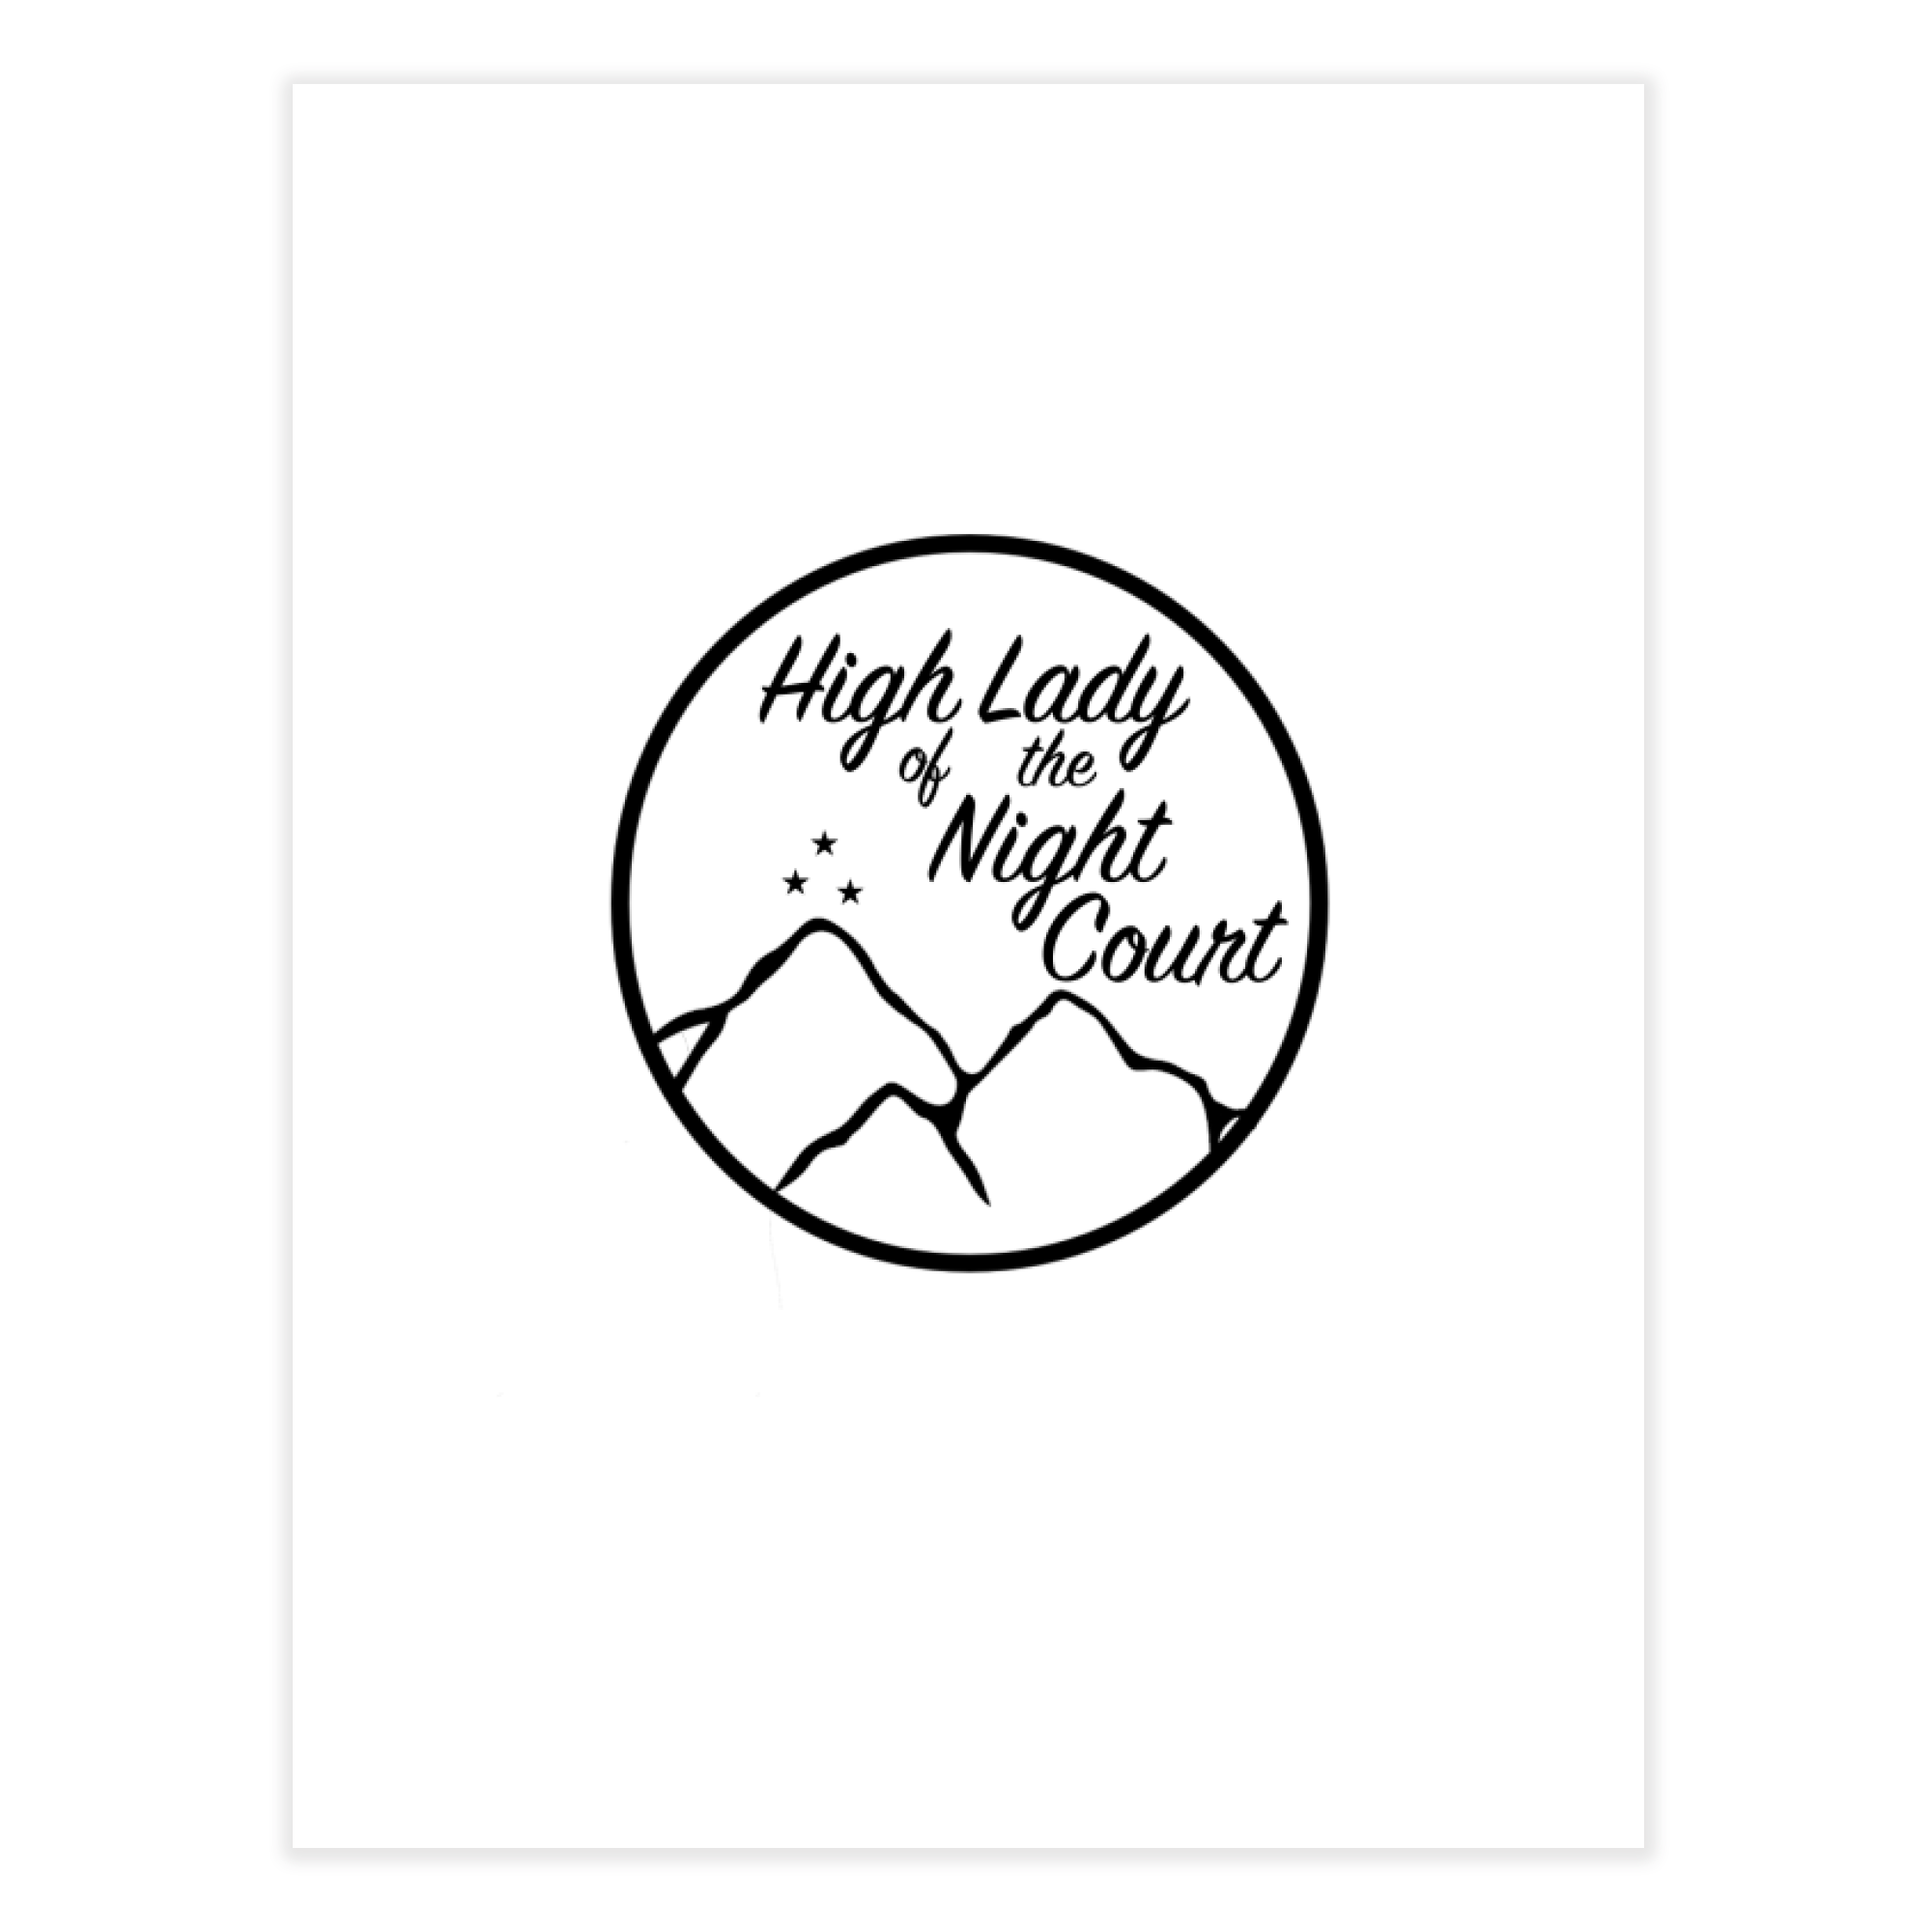 b625b19f155 High Lady of the Night Court